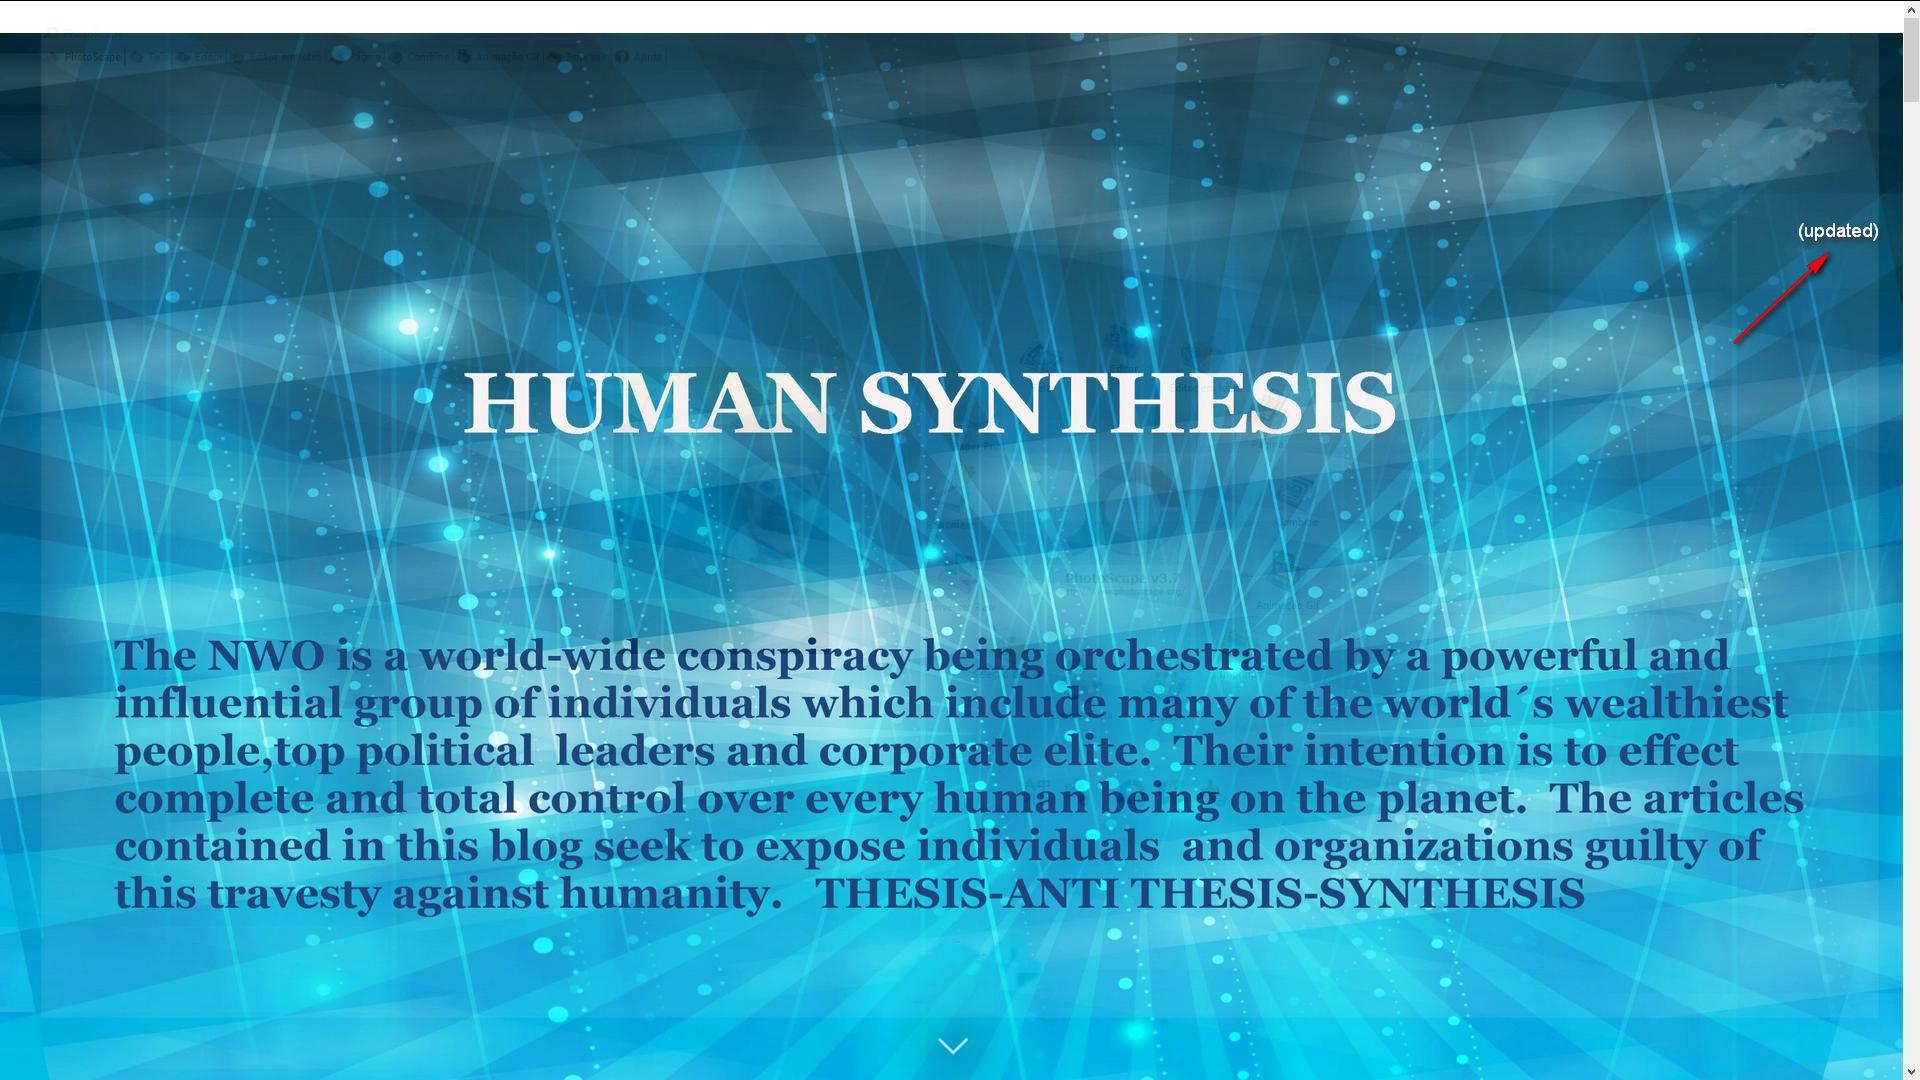 thesis anti-thesis synthesis